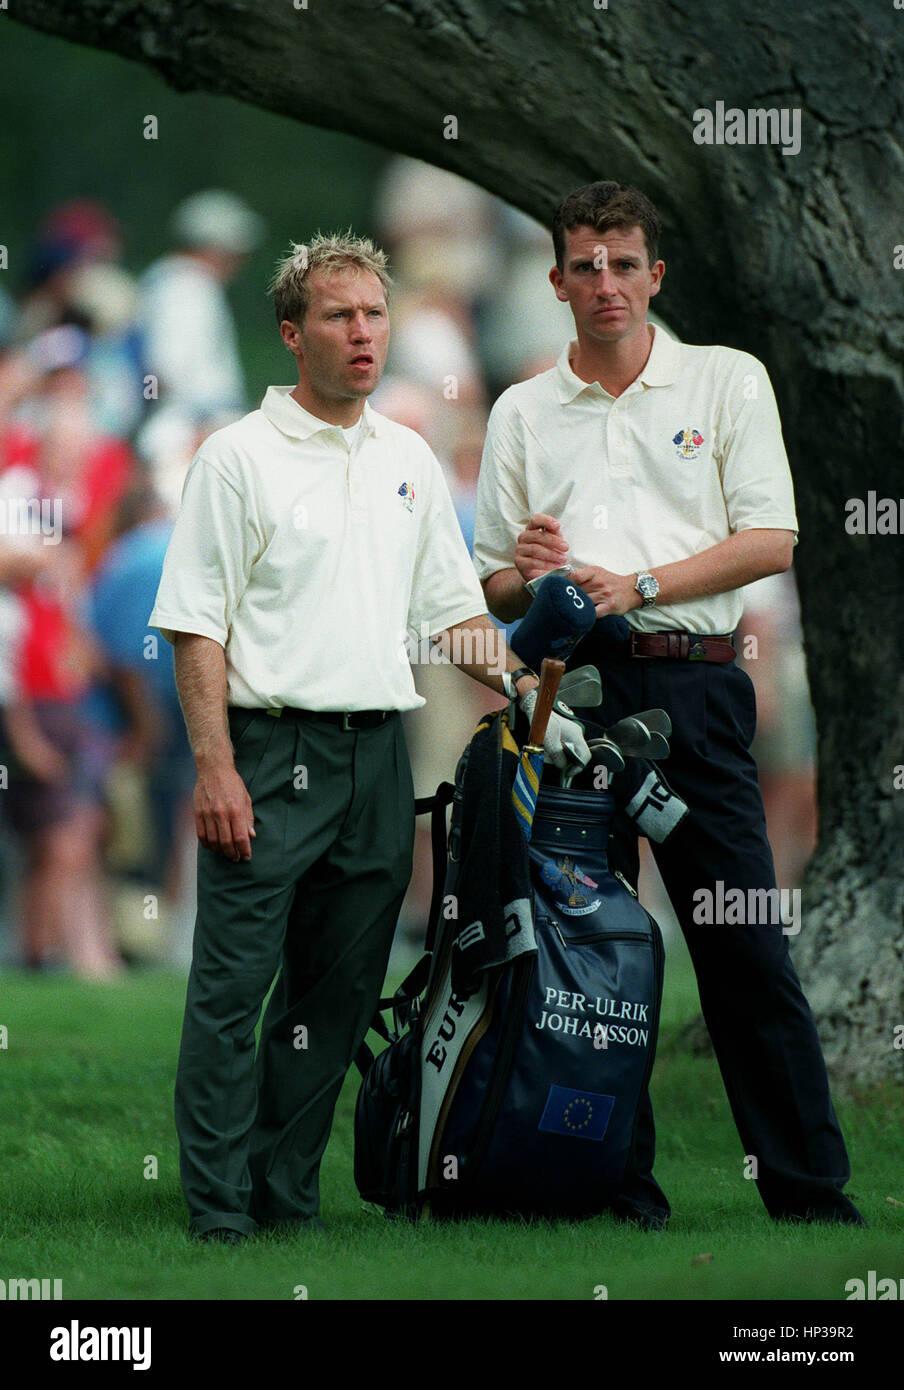 PER-ULRIK JOHANSSON RYDER CUP VALDERRAMA SPAIN 28 September 1997 - Stock Image